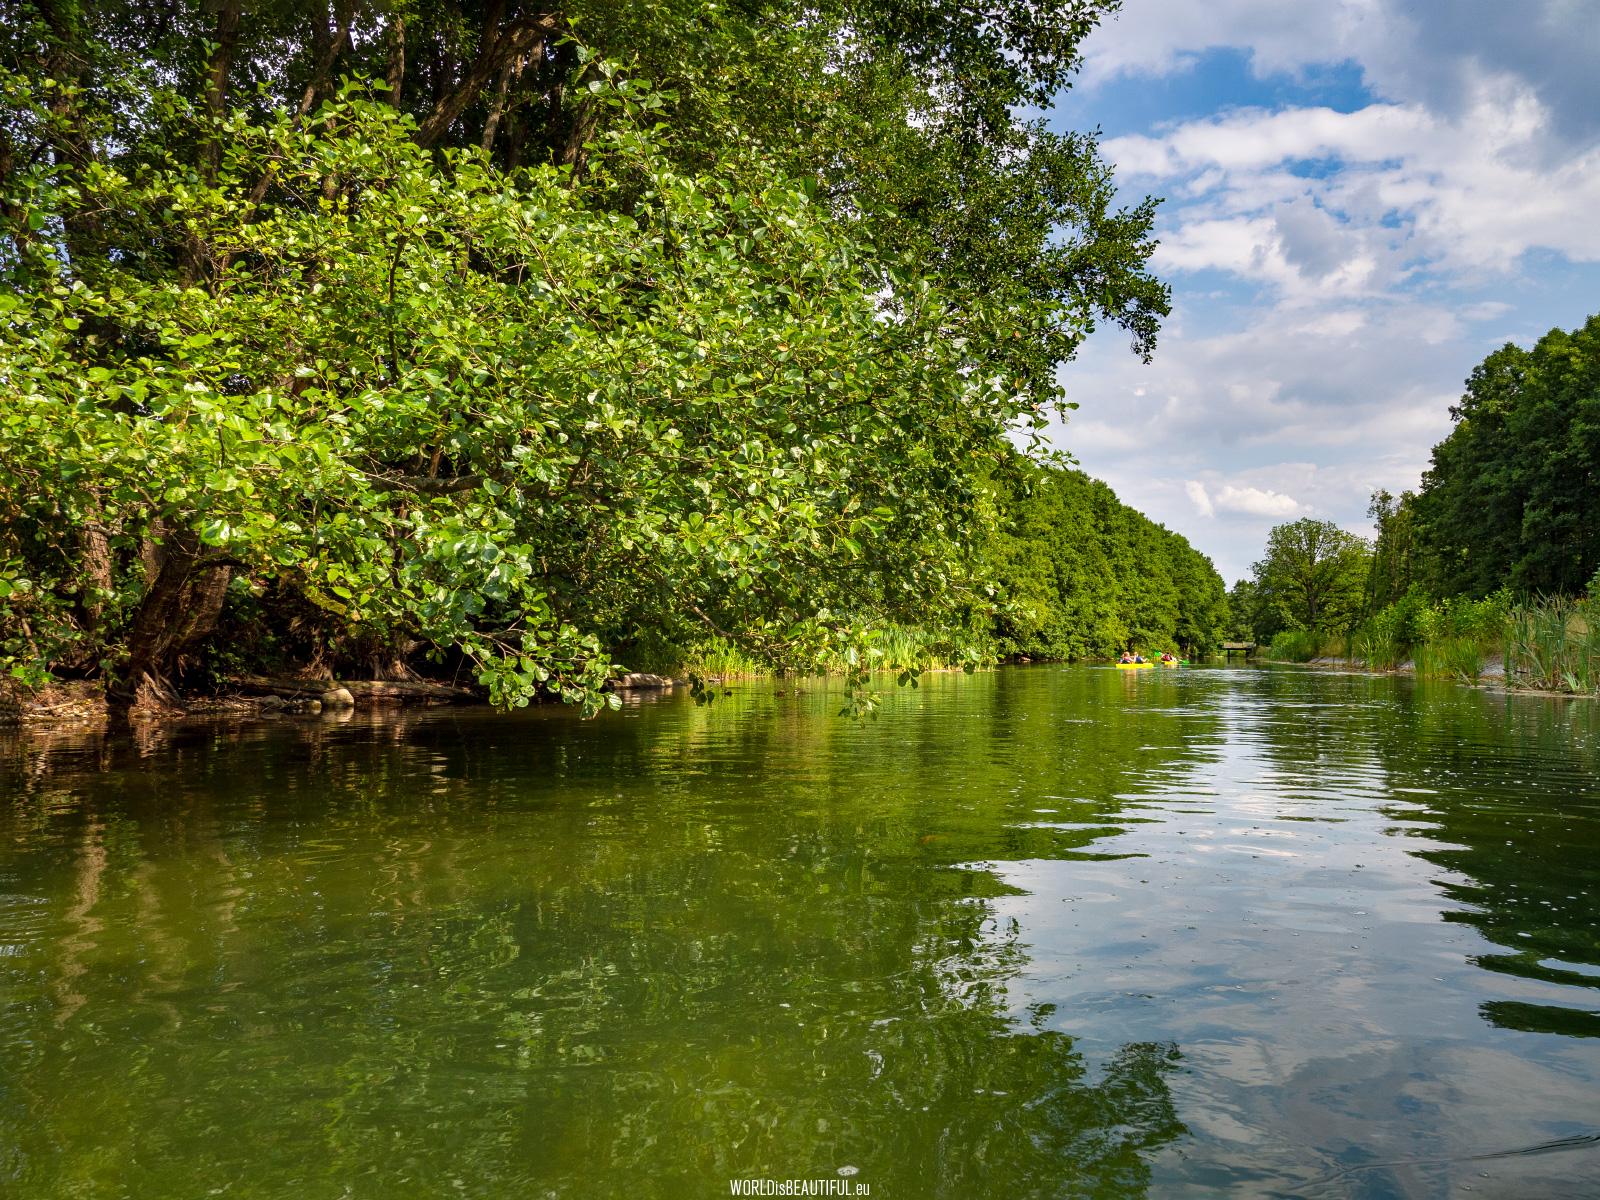 Borsk - Kanał Wdy